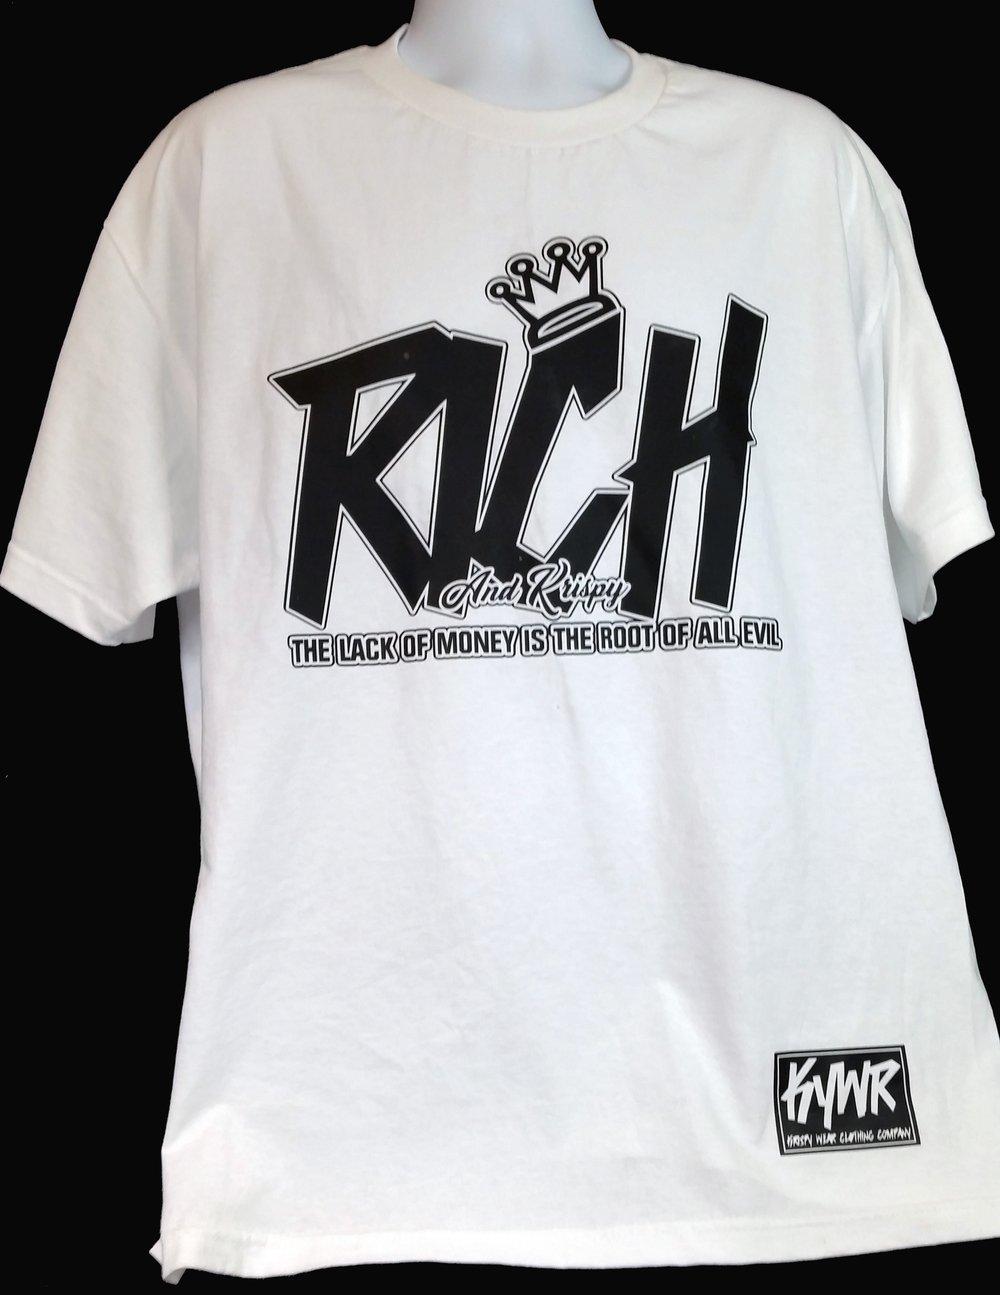 Image of Rich and Krispy crewneck tshirt